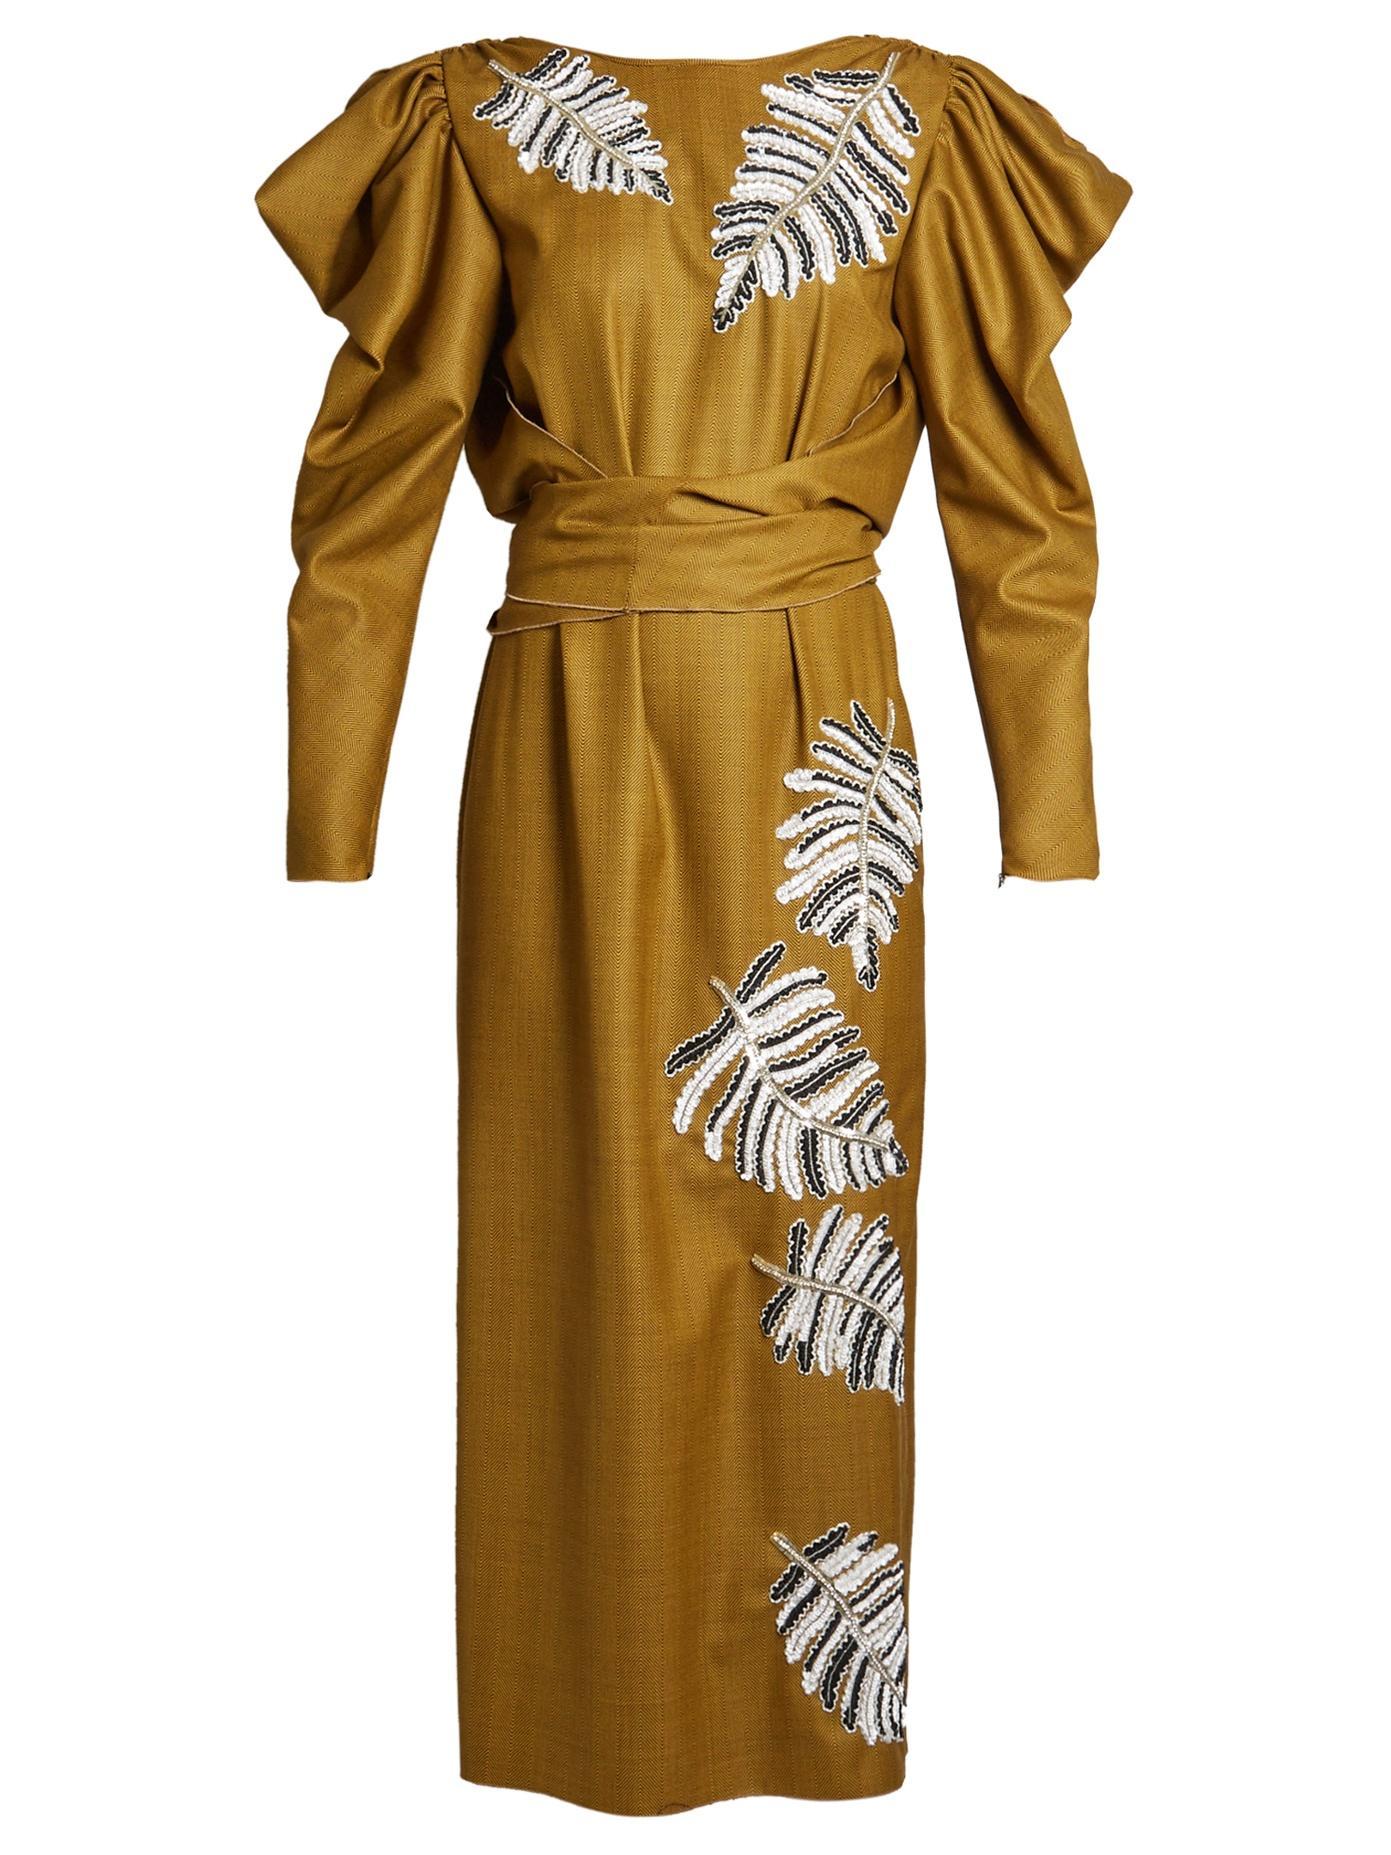 Attico Livia Sequin-Embellised Stretch-Wool Dress In Brown Multi